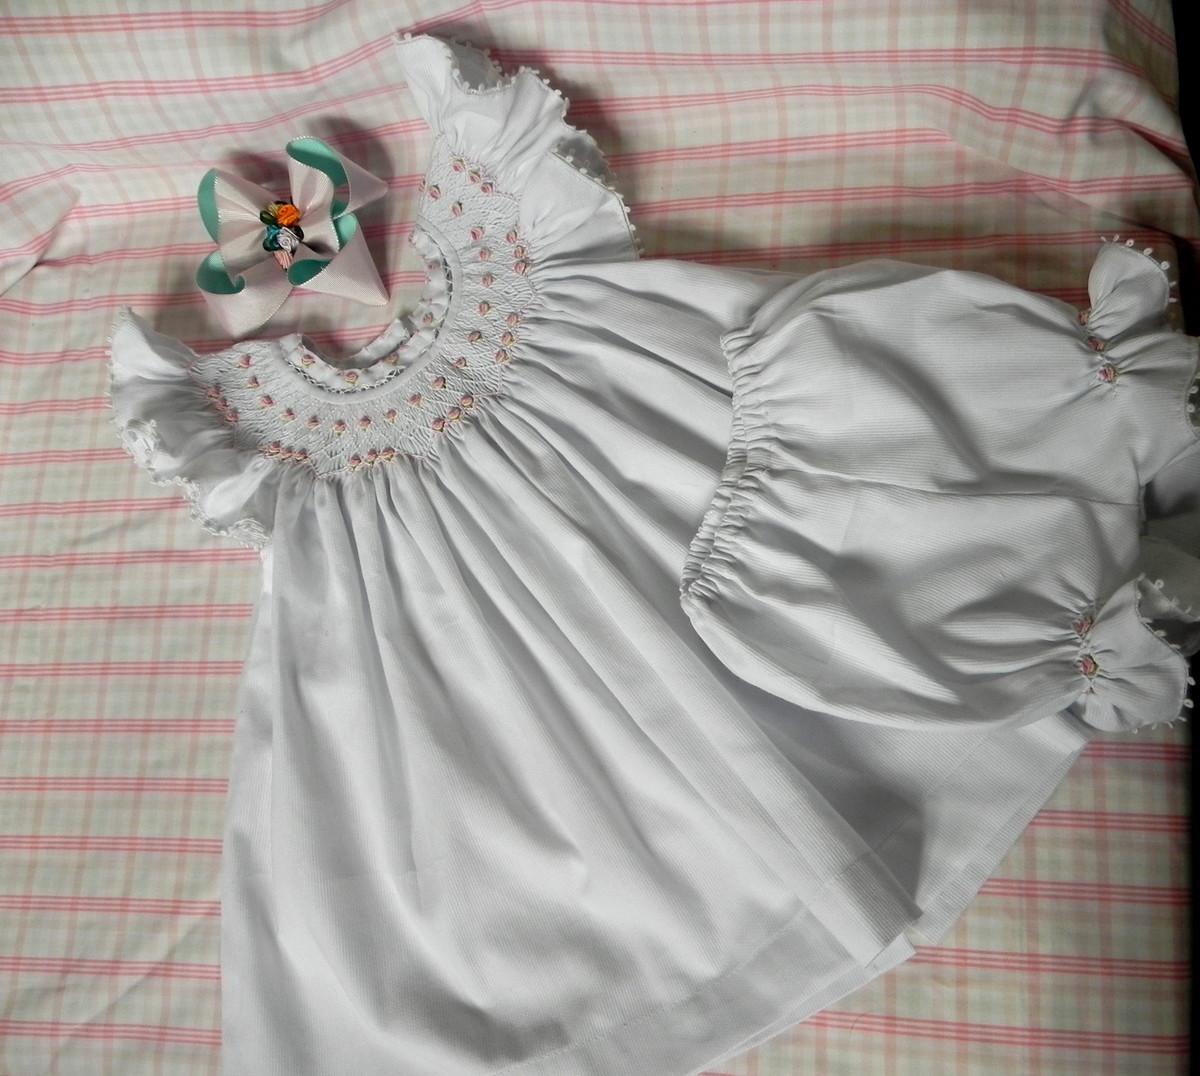 f2578bab20 Vestido Infantil bordado no Elo7